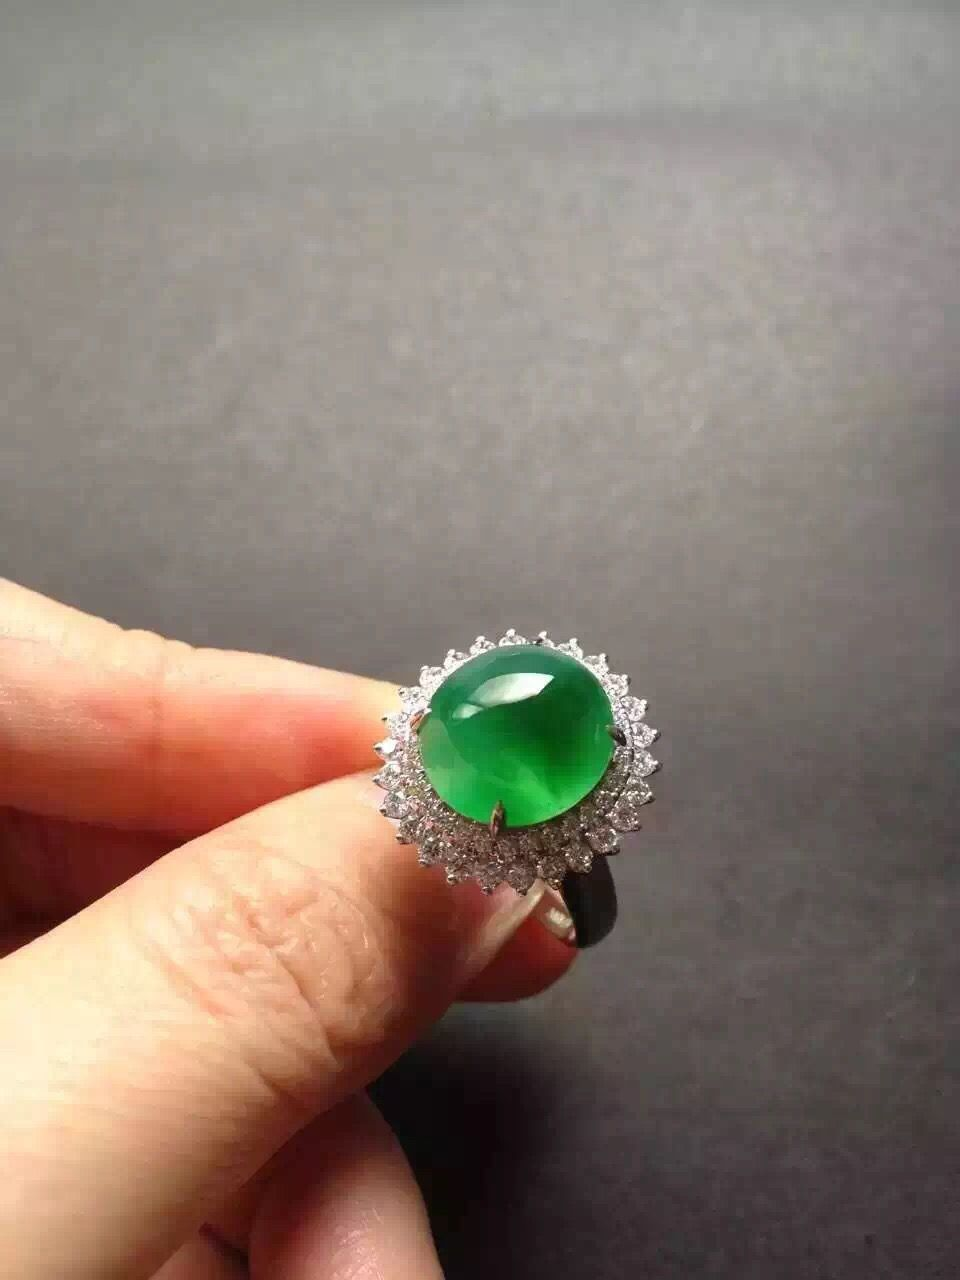 Gorgeous clear icy royal green jade wedding ring 5K Jade Precious Gem